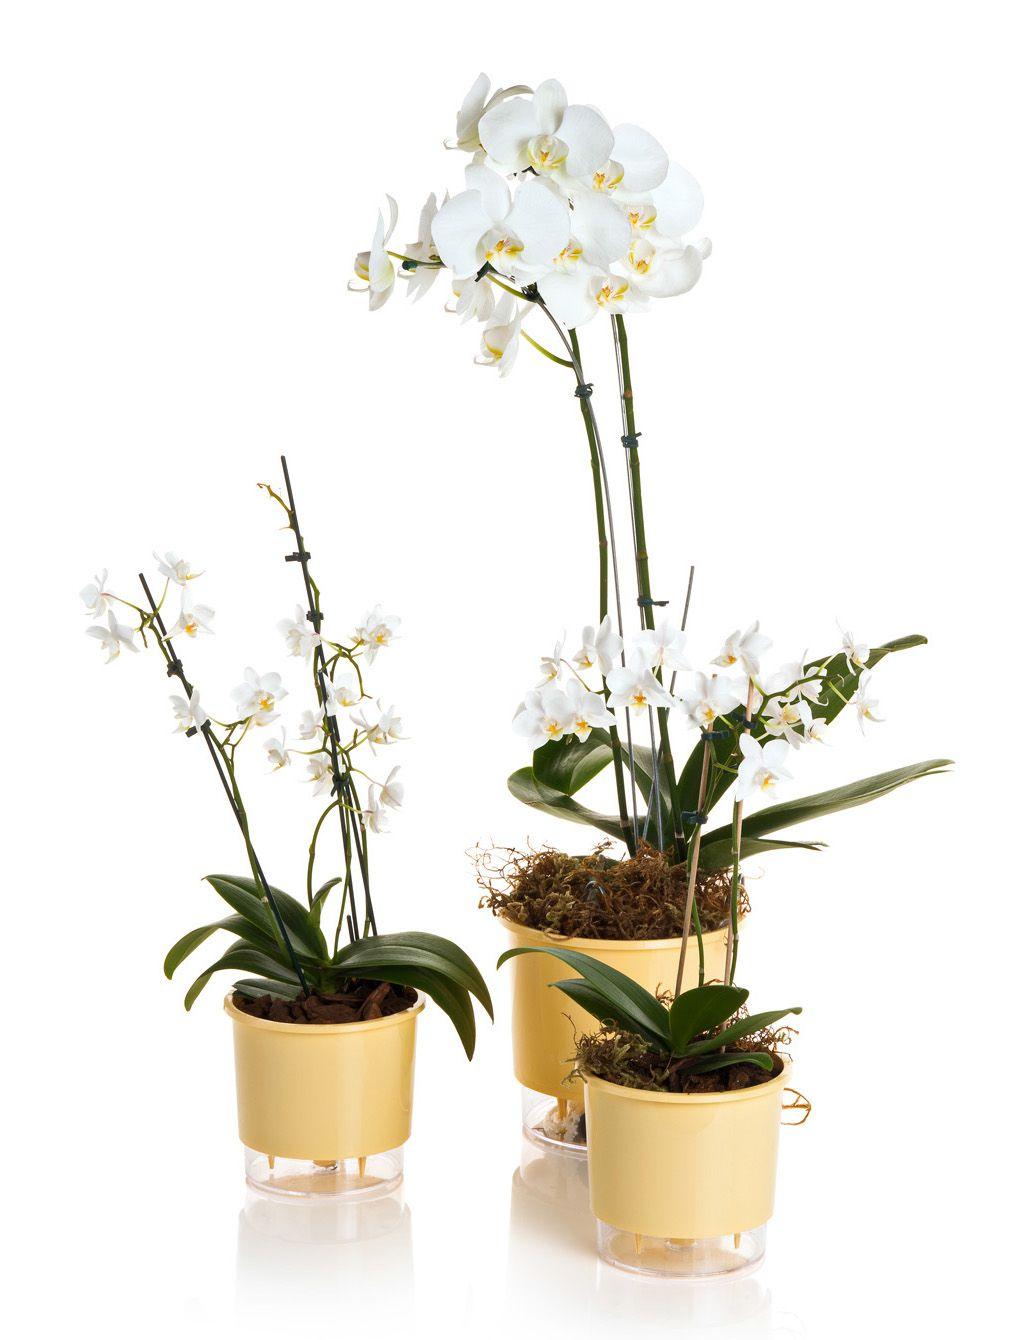 Vaso Autoirrigável Pequeno 12cm x 11cm Pêssego Wishes N02  - Vasos Raiz Loja Oficial